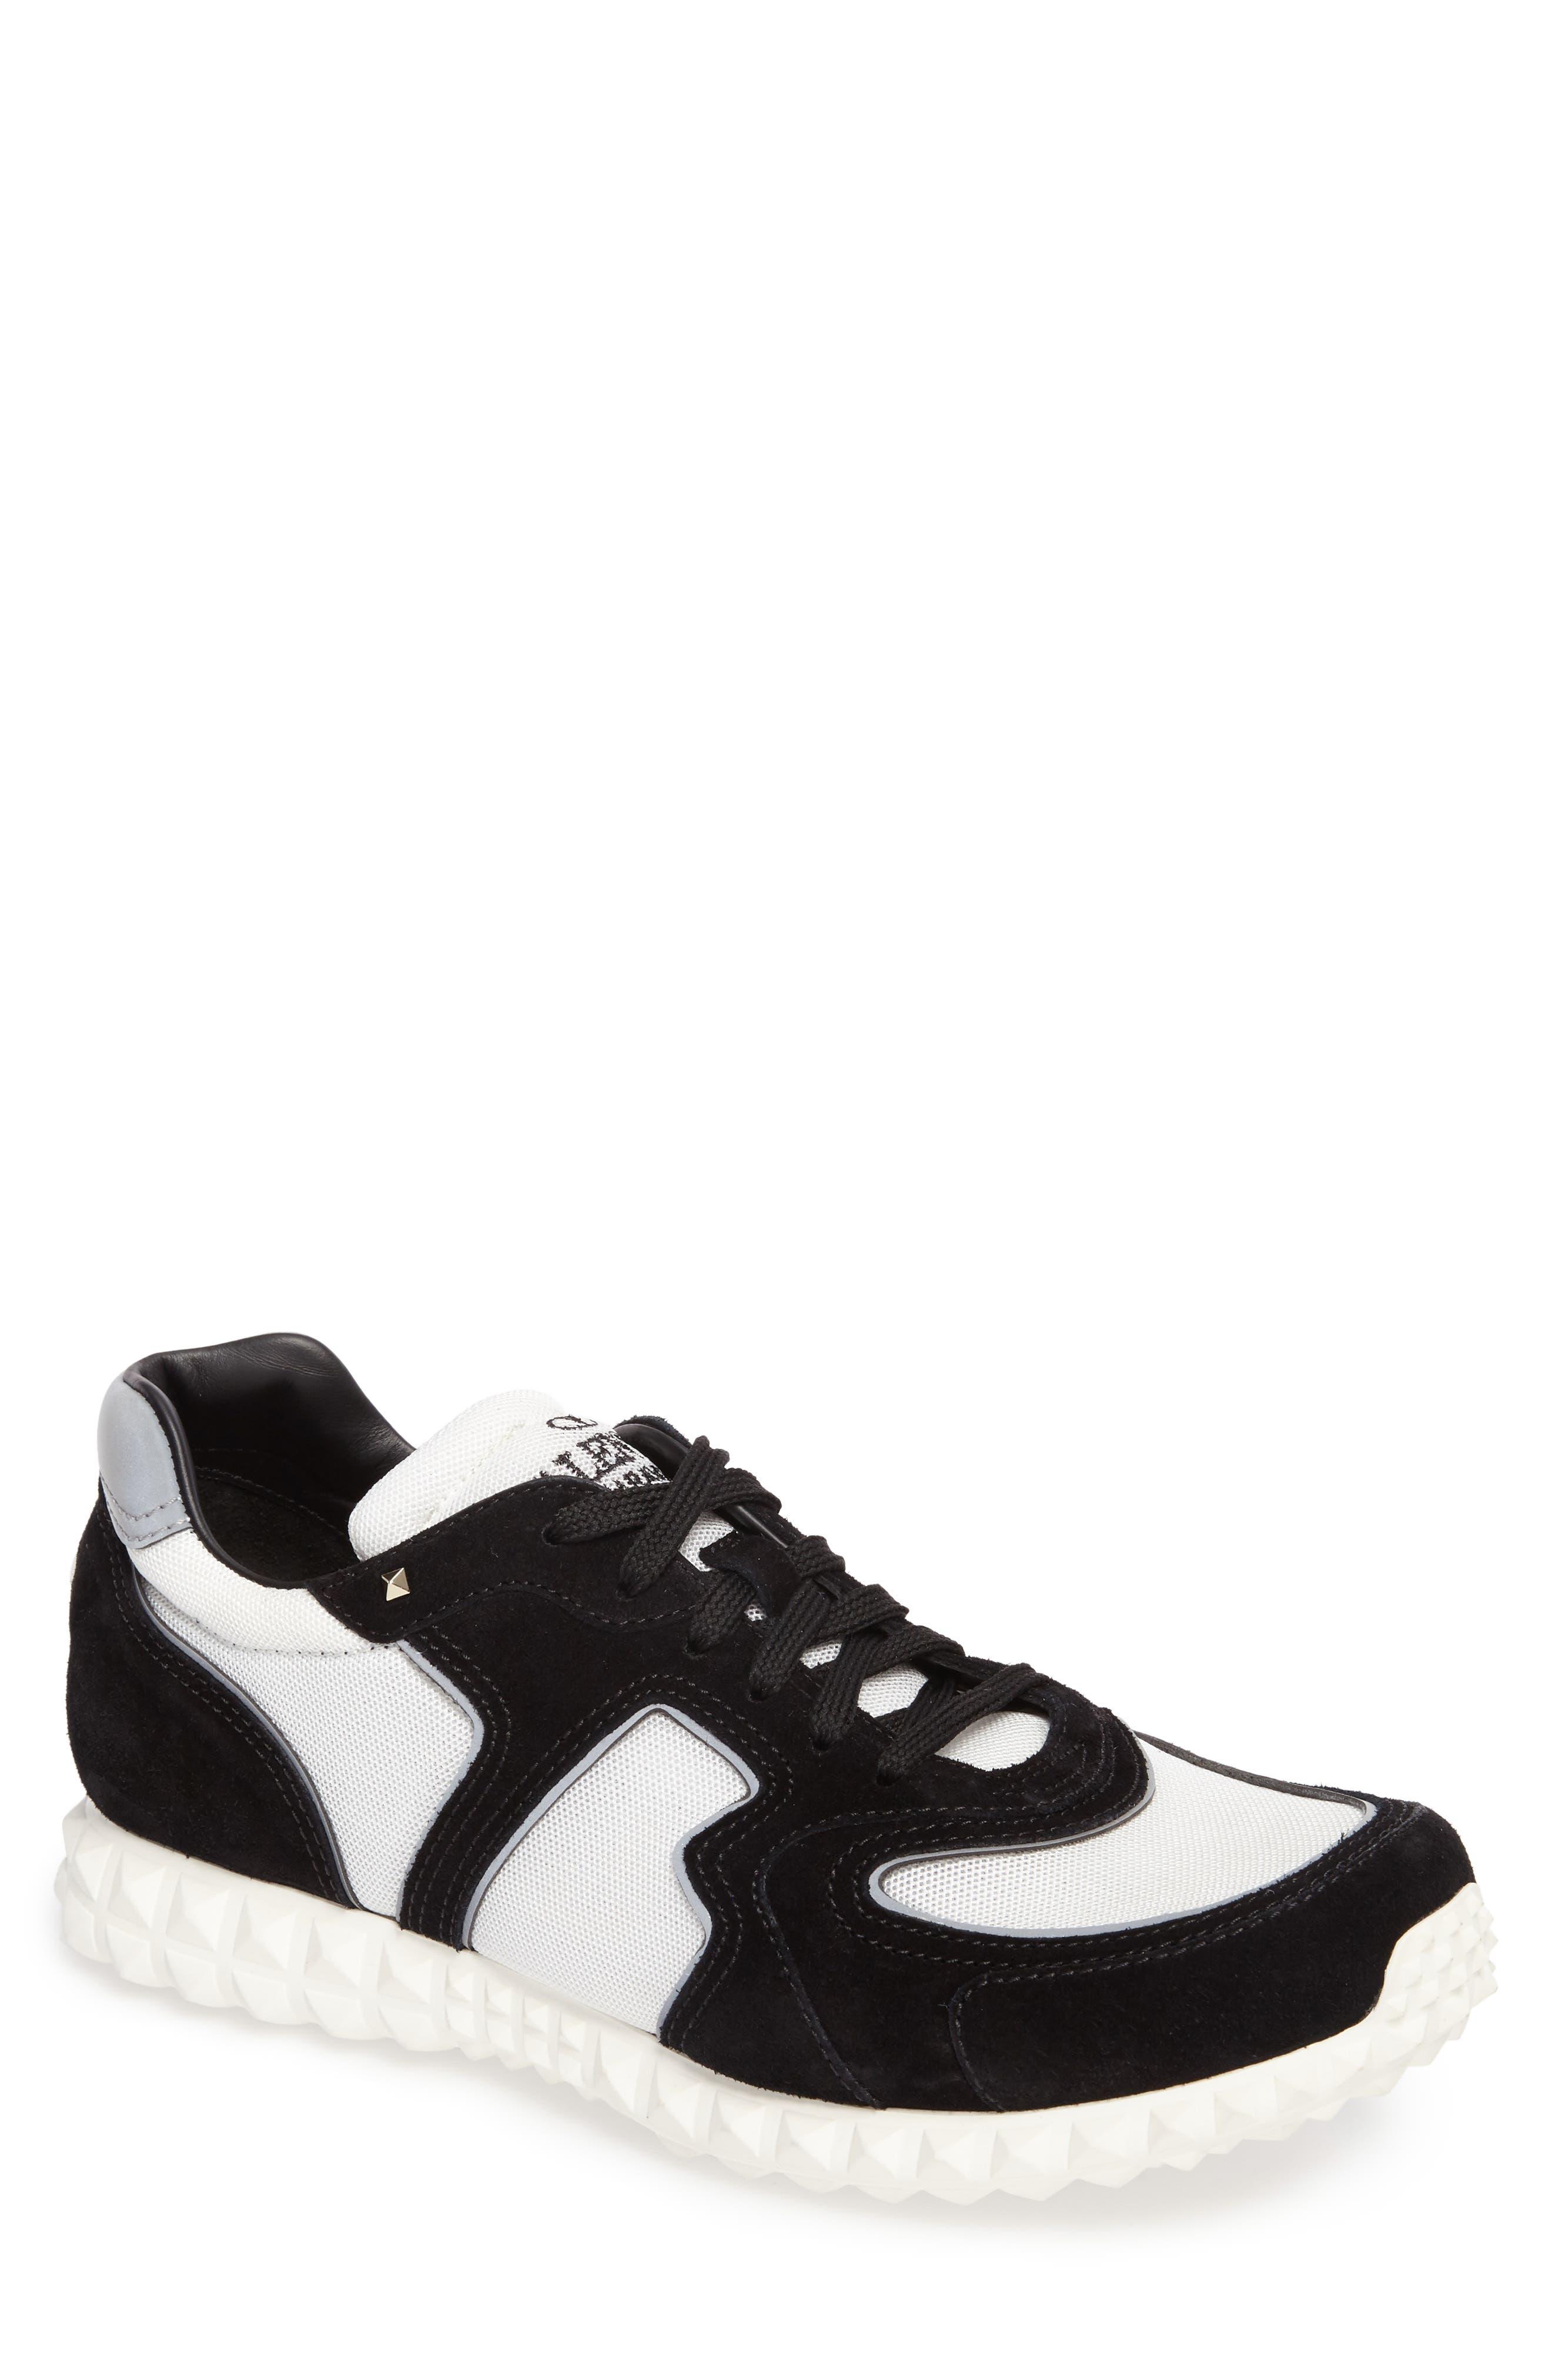 Alternate Image 1 Selected - VALENTINO GARAVANI Soul AM Sneaker (Men)